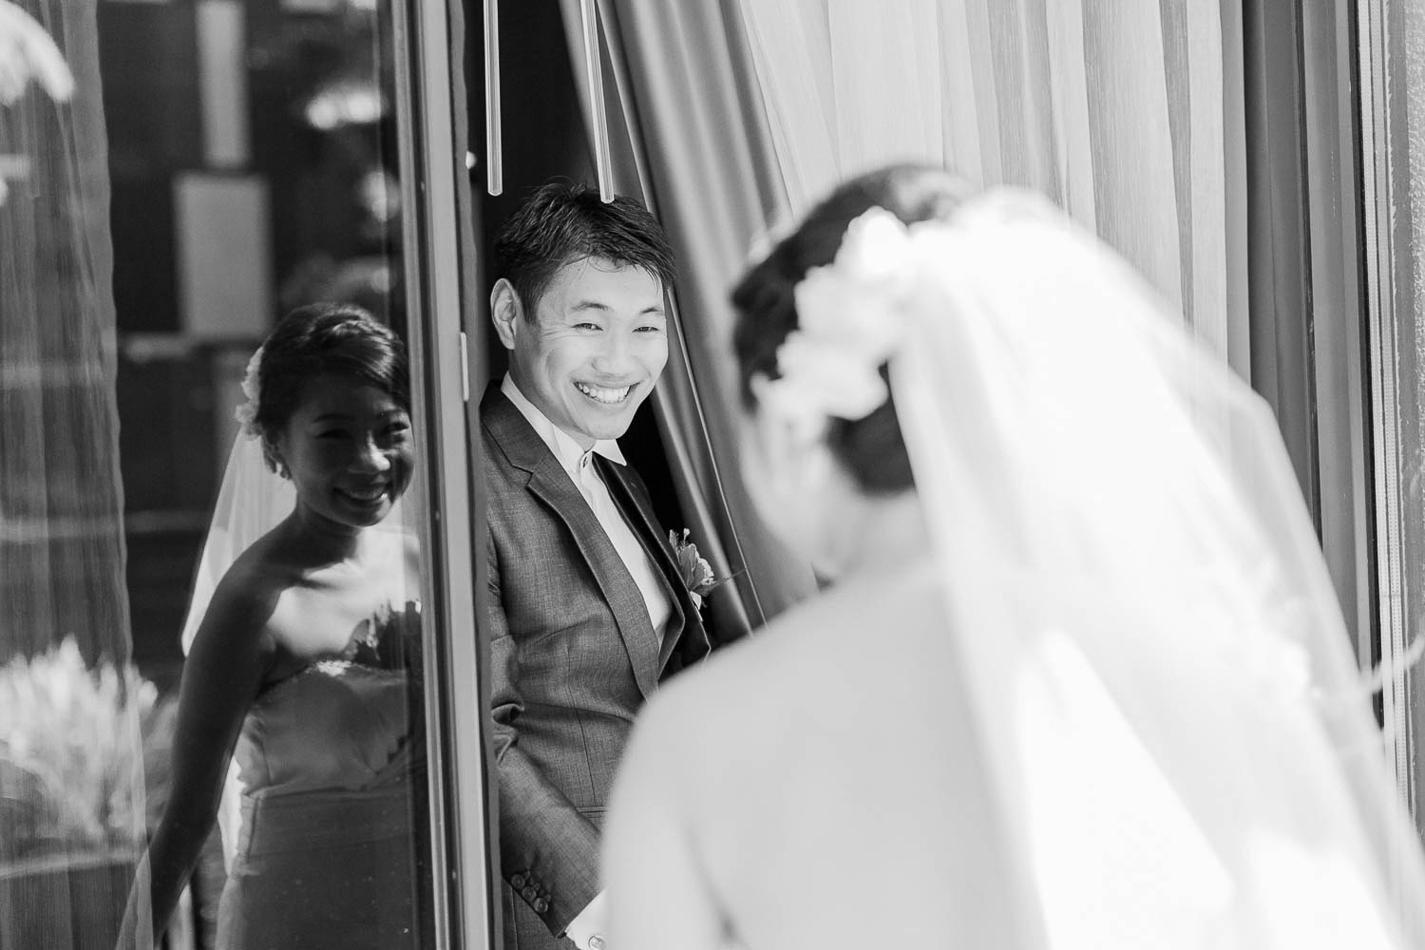 wedding-photographer-singapore-film-photographer-chen-sands-MinKang-wedding-CSPBLOG-6.jpg